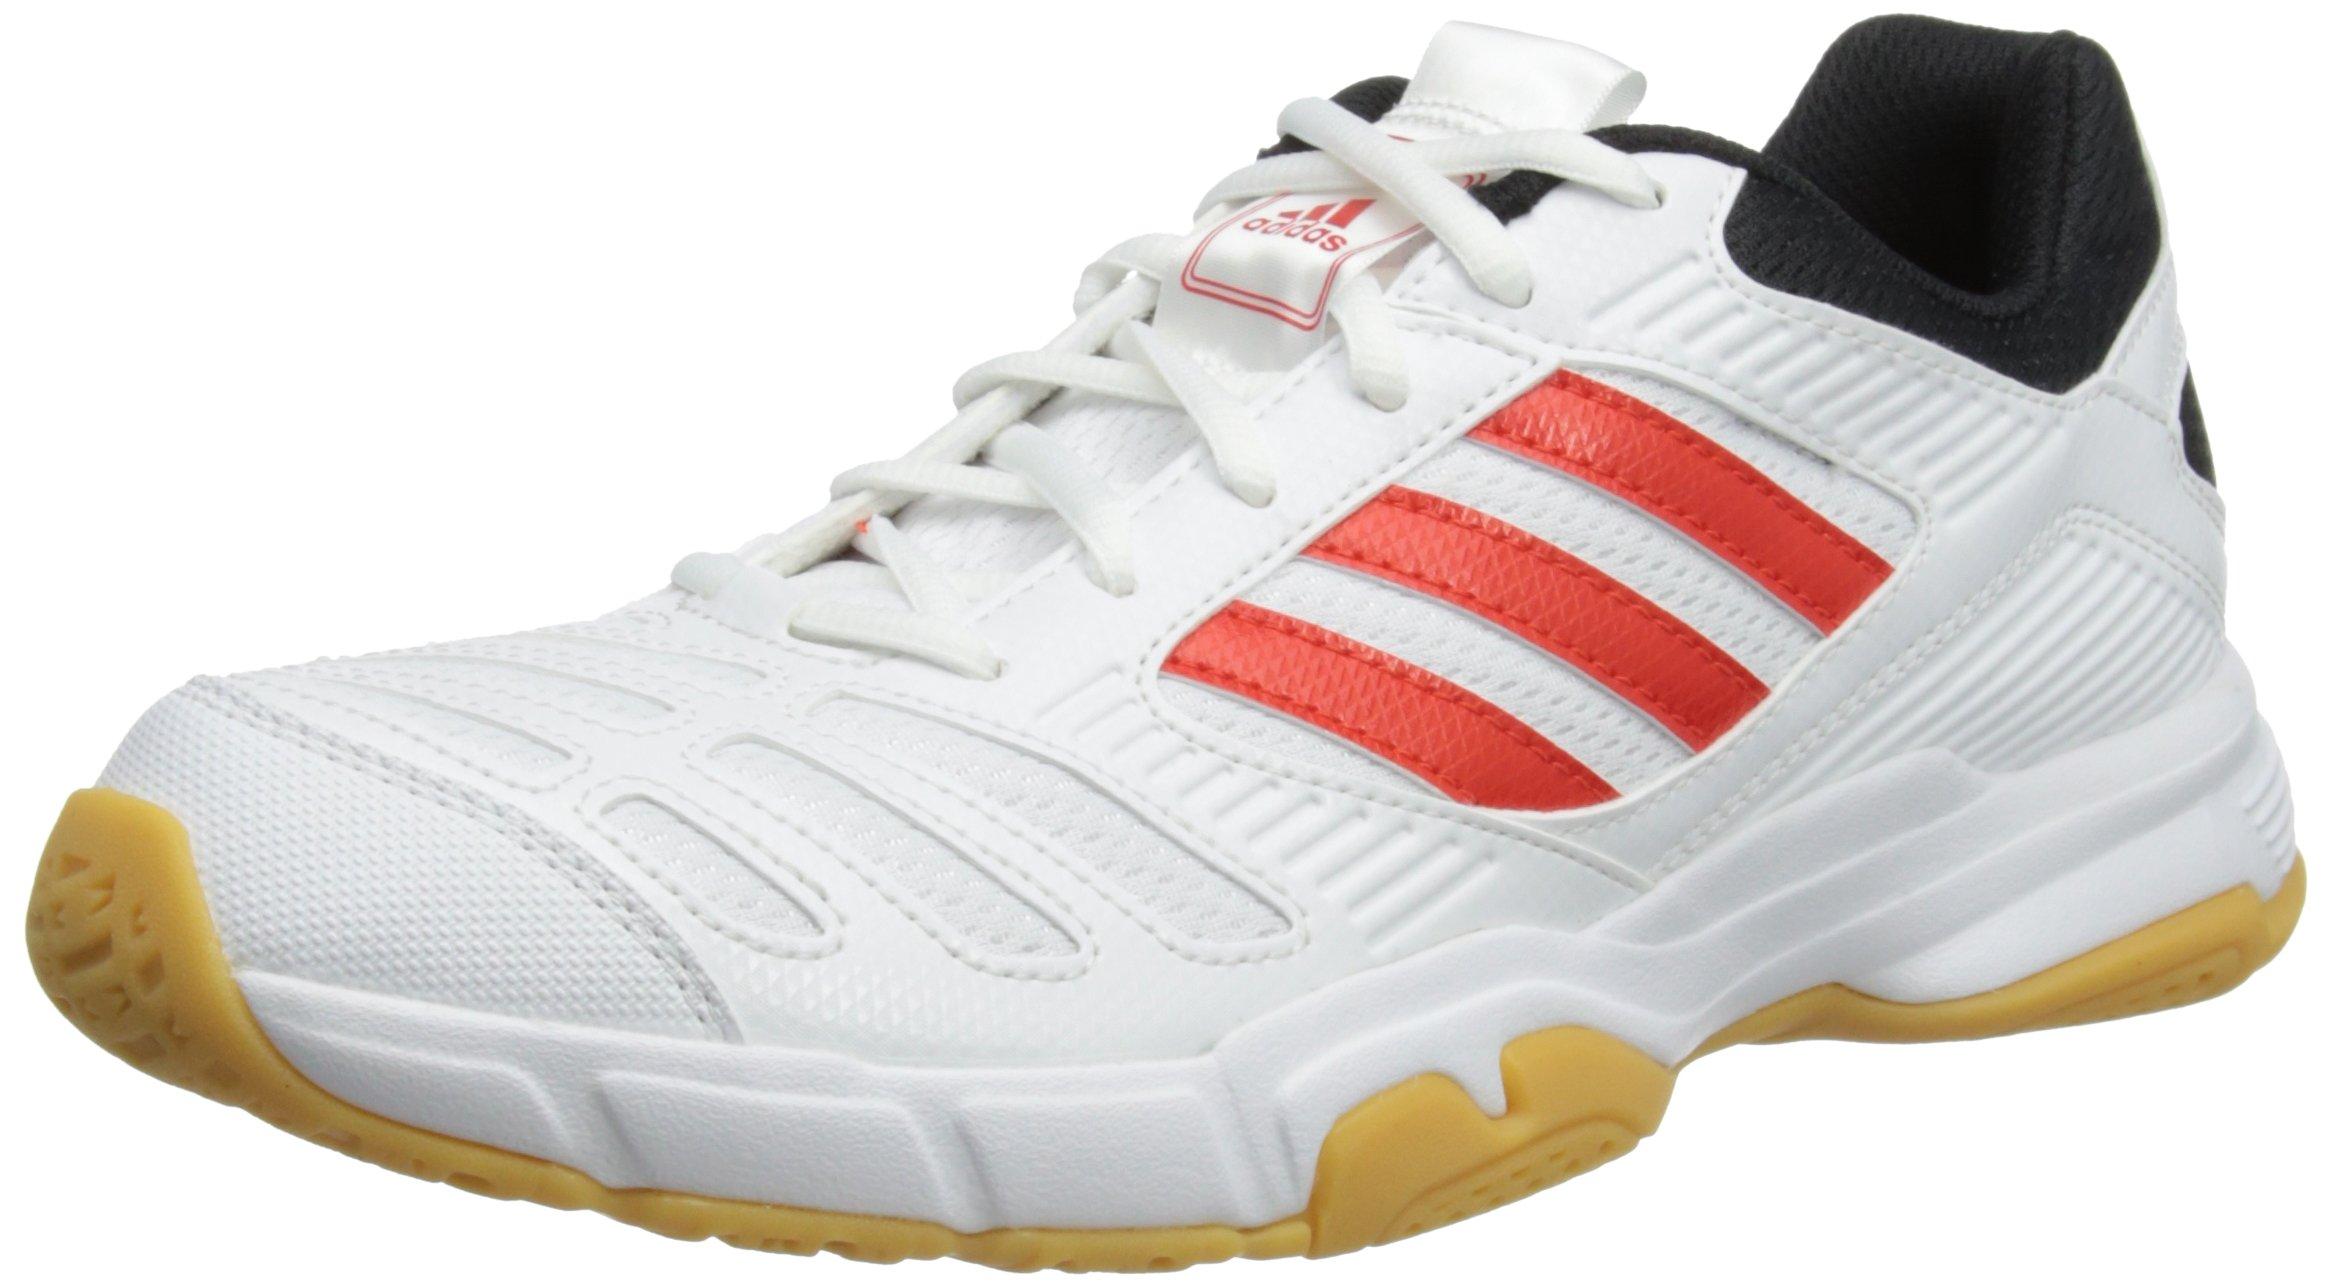 ADIDAS BT Boom Men's Badminton Shoe